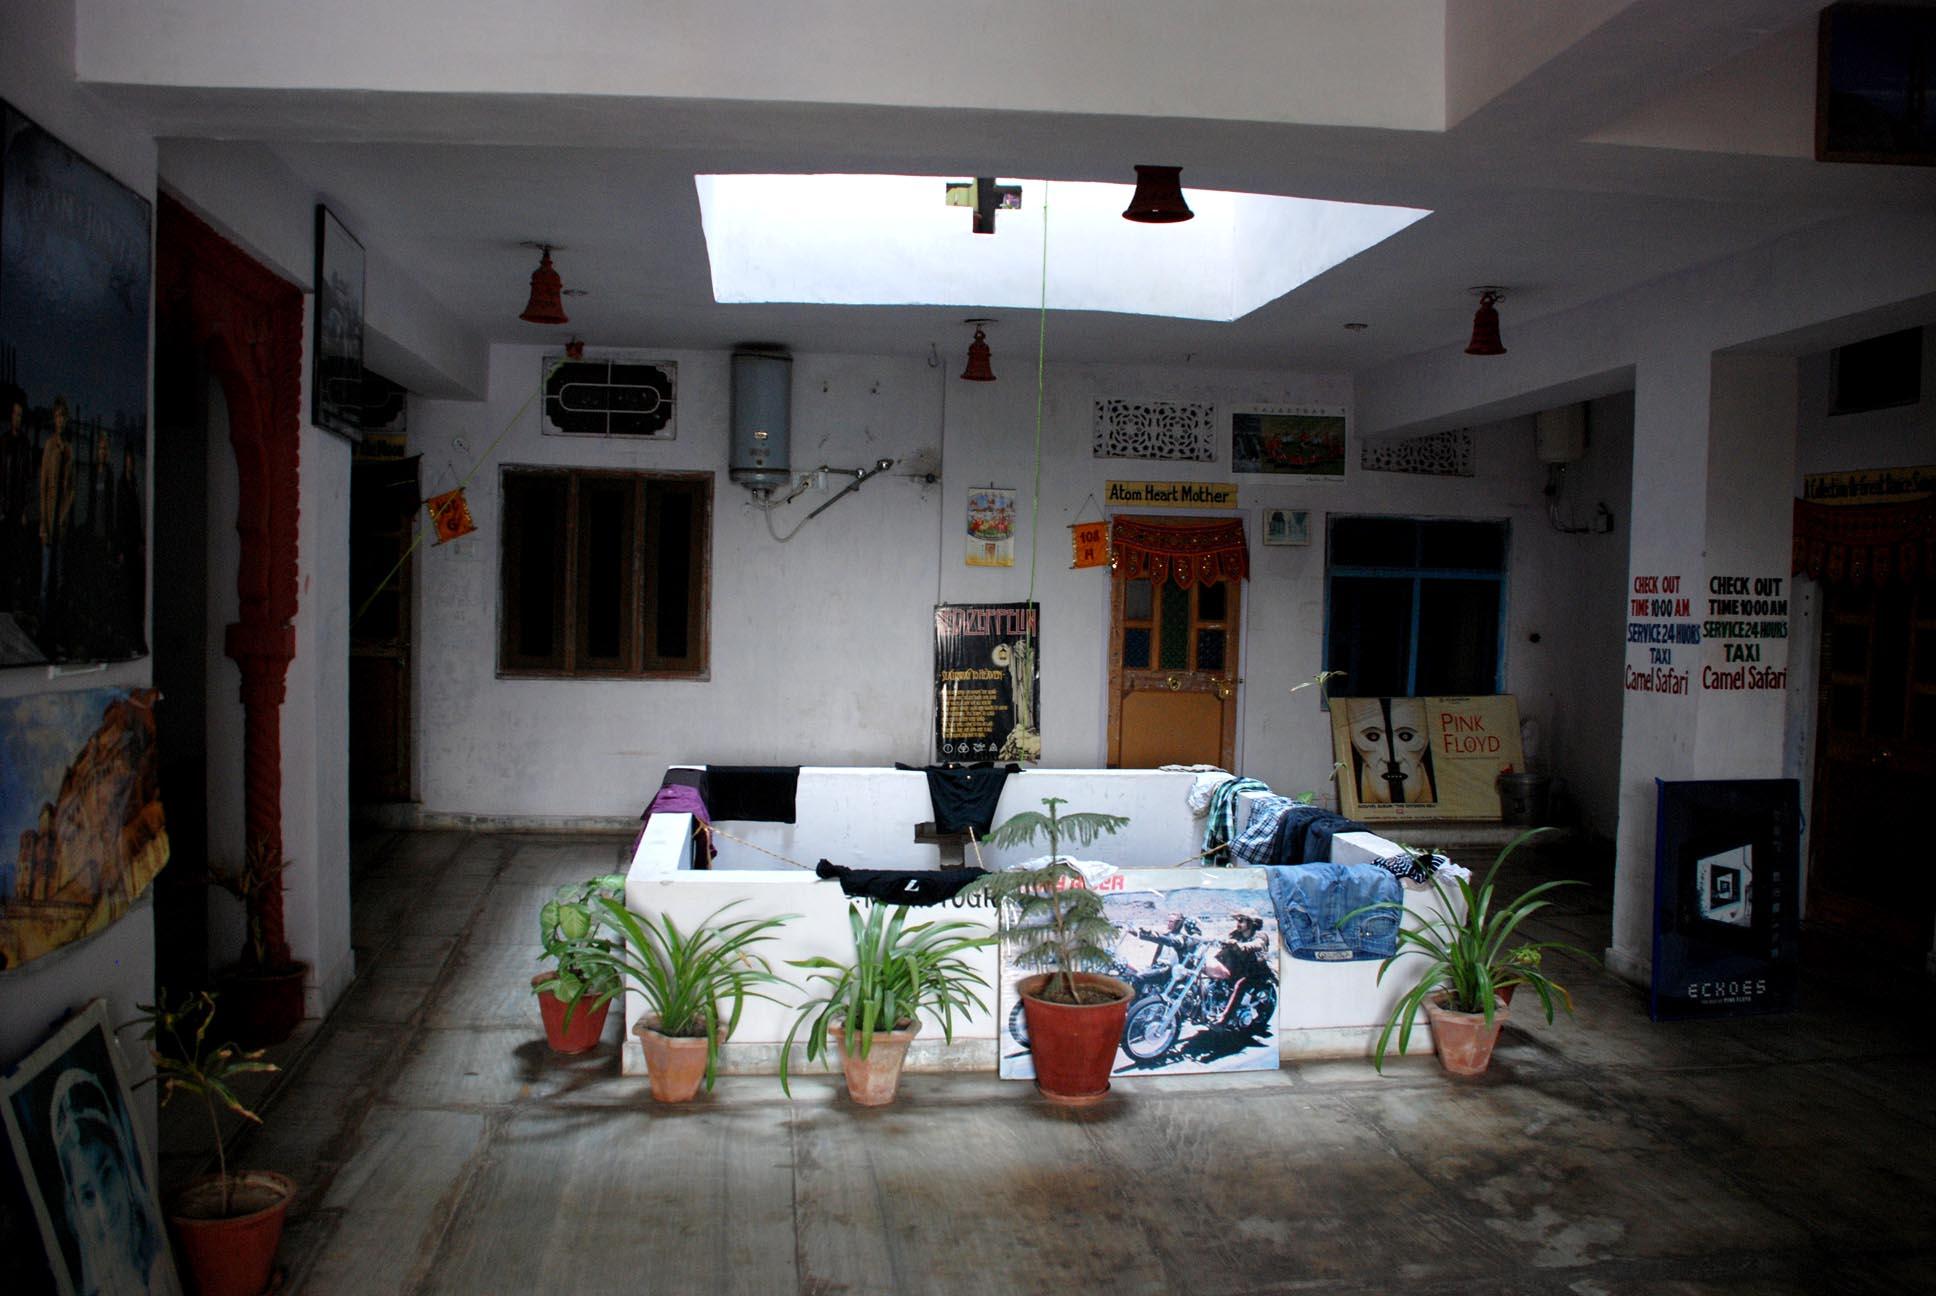 Interiors - First Floor